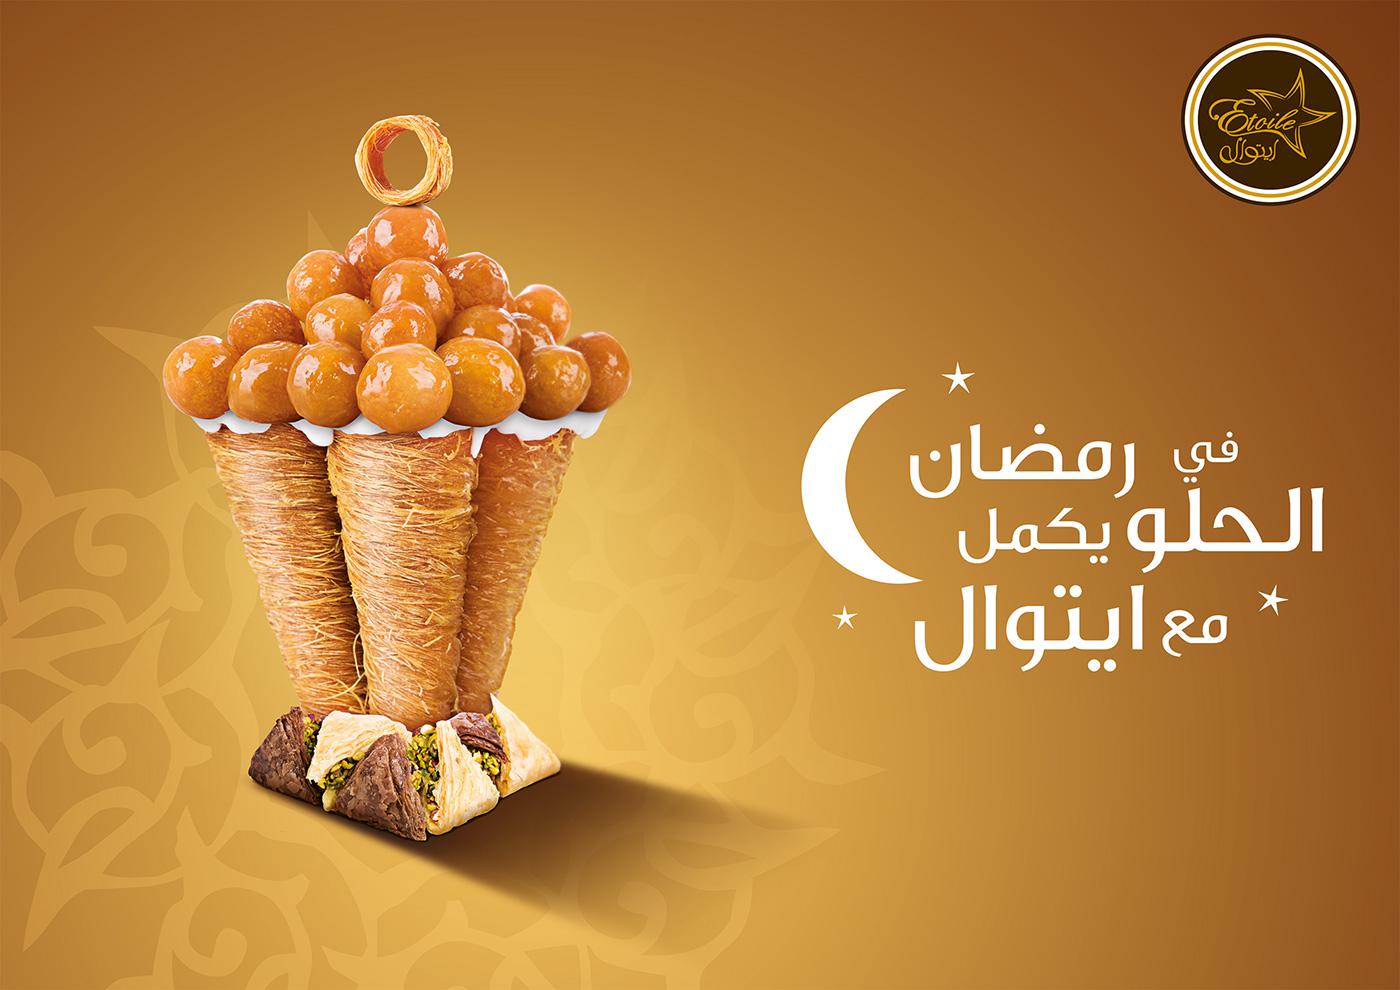 affiche-etoile-ramadan-Kannefa-fanous